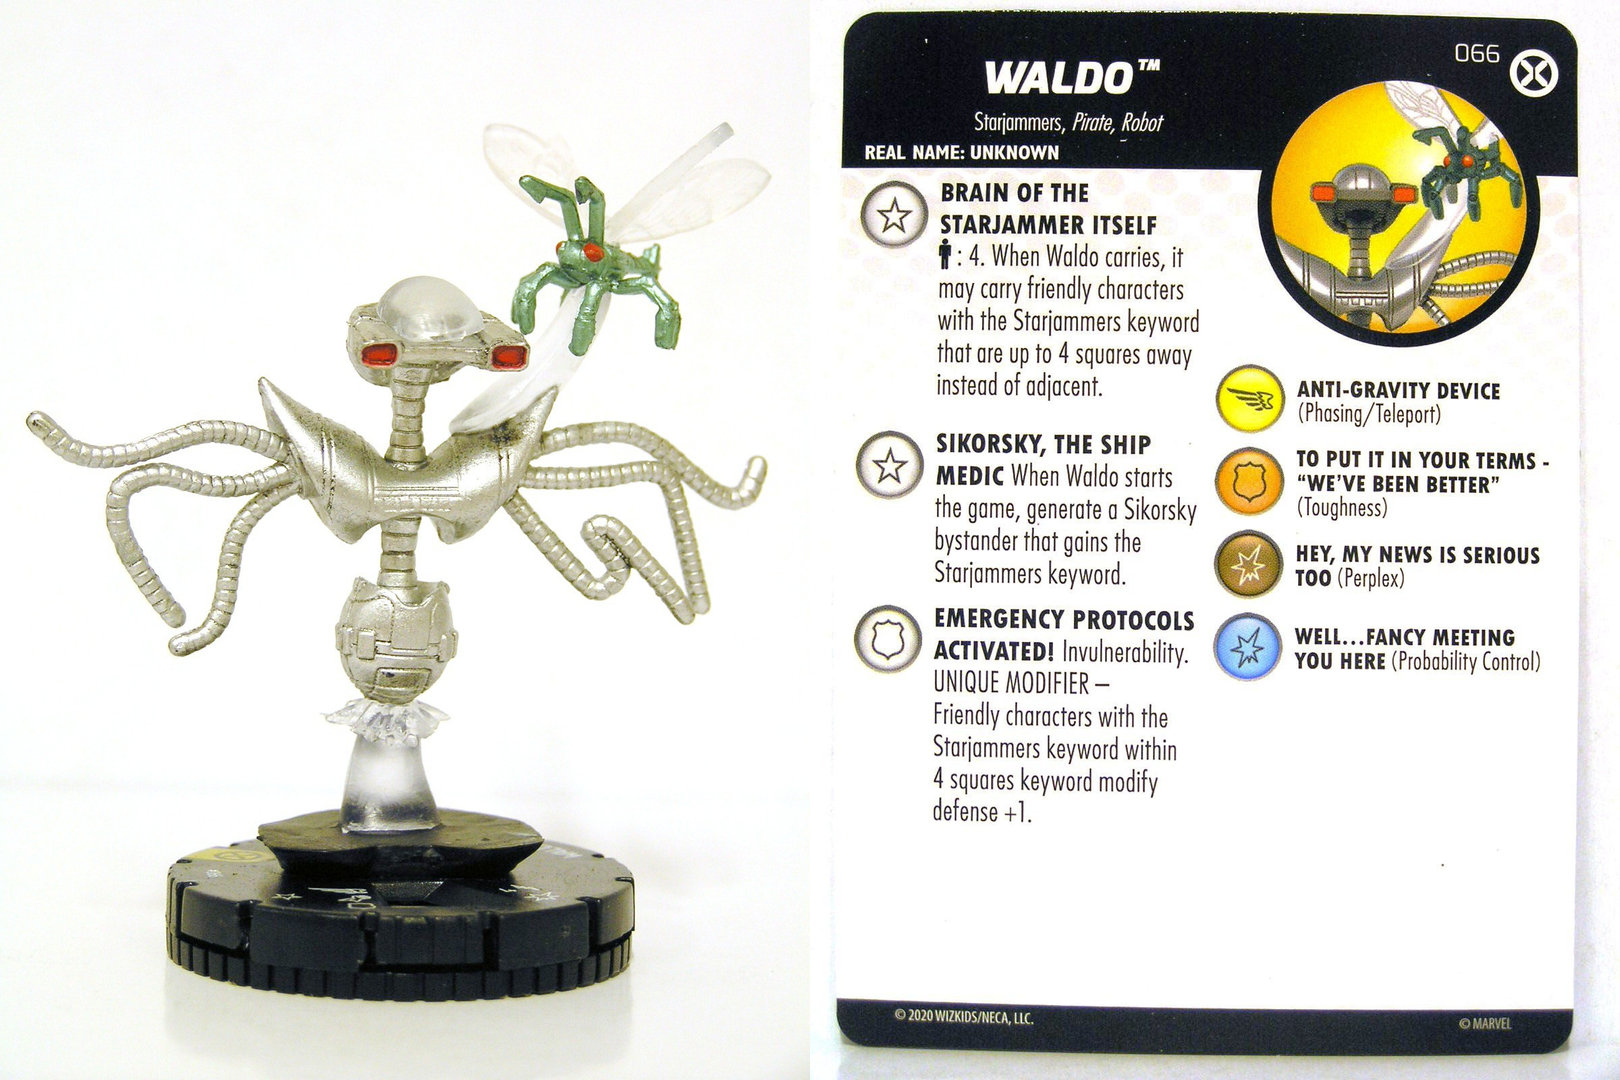 szkola-liderow.pl Details about WALDO 066 X-Men House of X Marvel ...